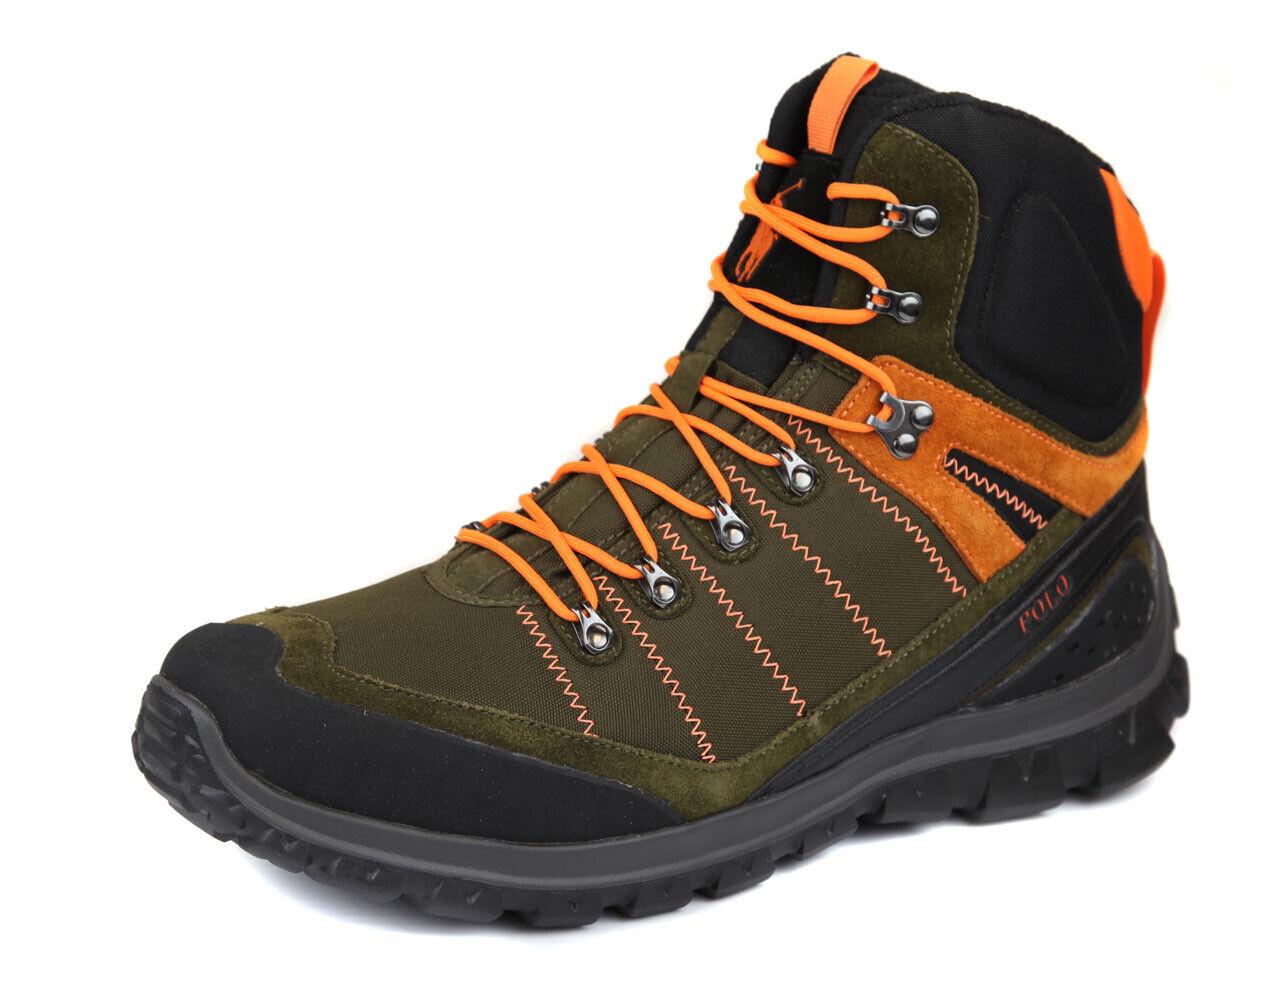 Polo Ralph Lauren para hombre Oliva Naranja S Con Cordones Zapatos Bota Ret  Nuevo